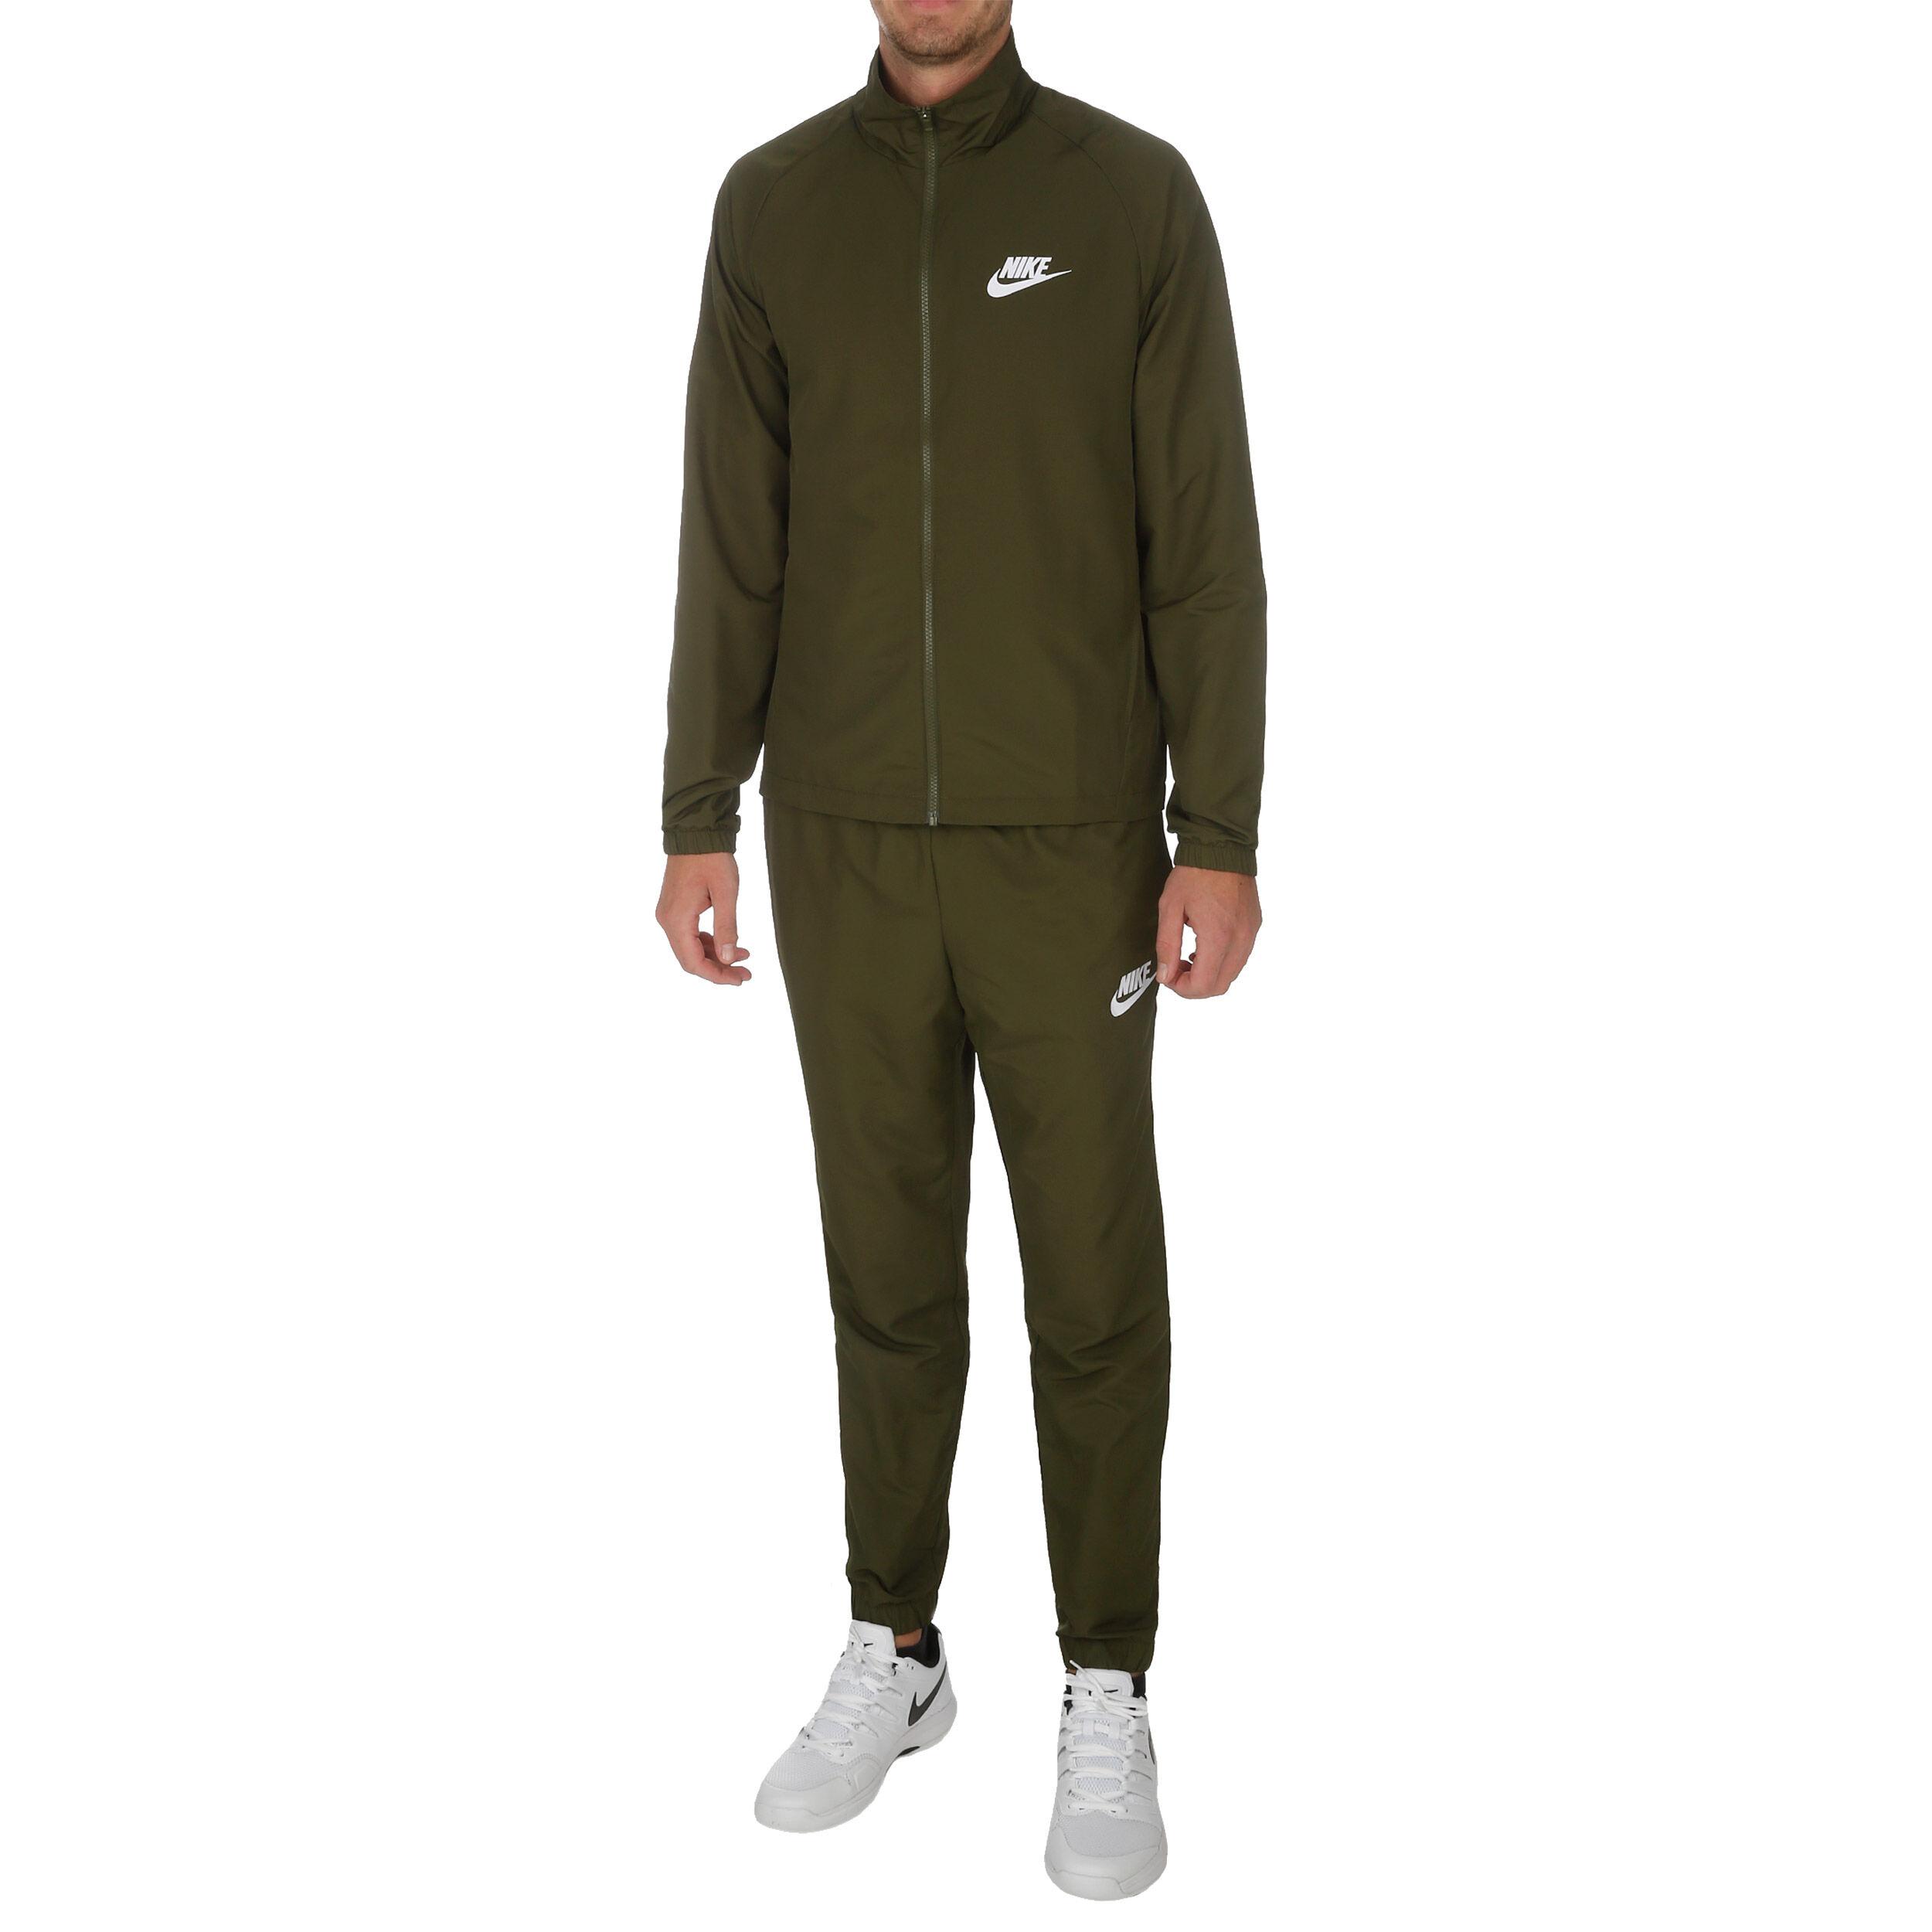 Herren OlivWeiß Online Kaufen Nike Trainingsanzug Sportswear yY6gbf7